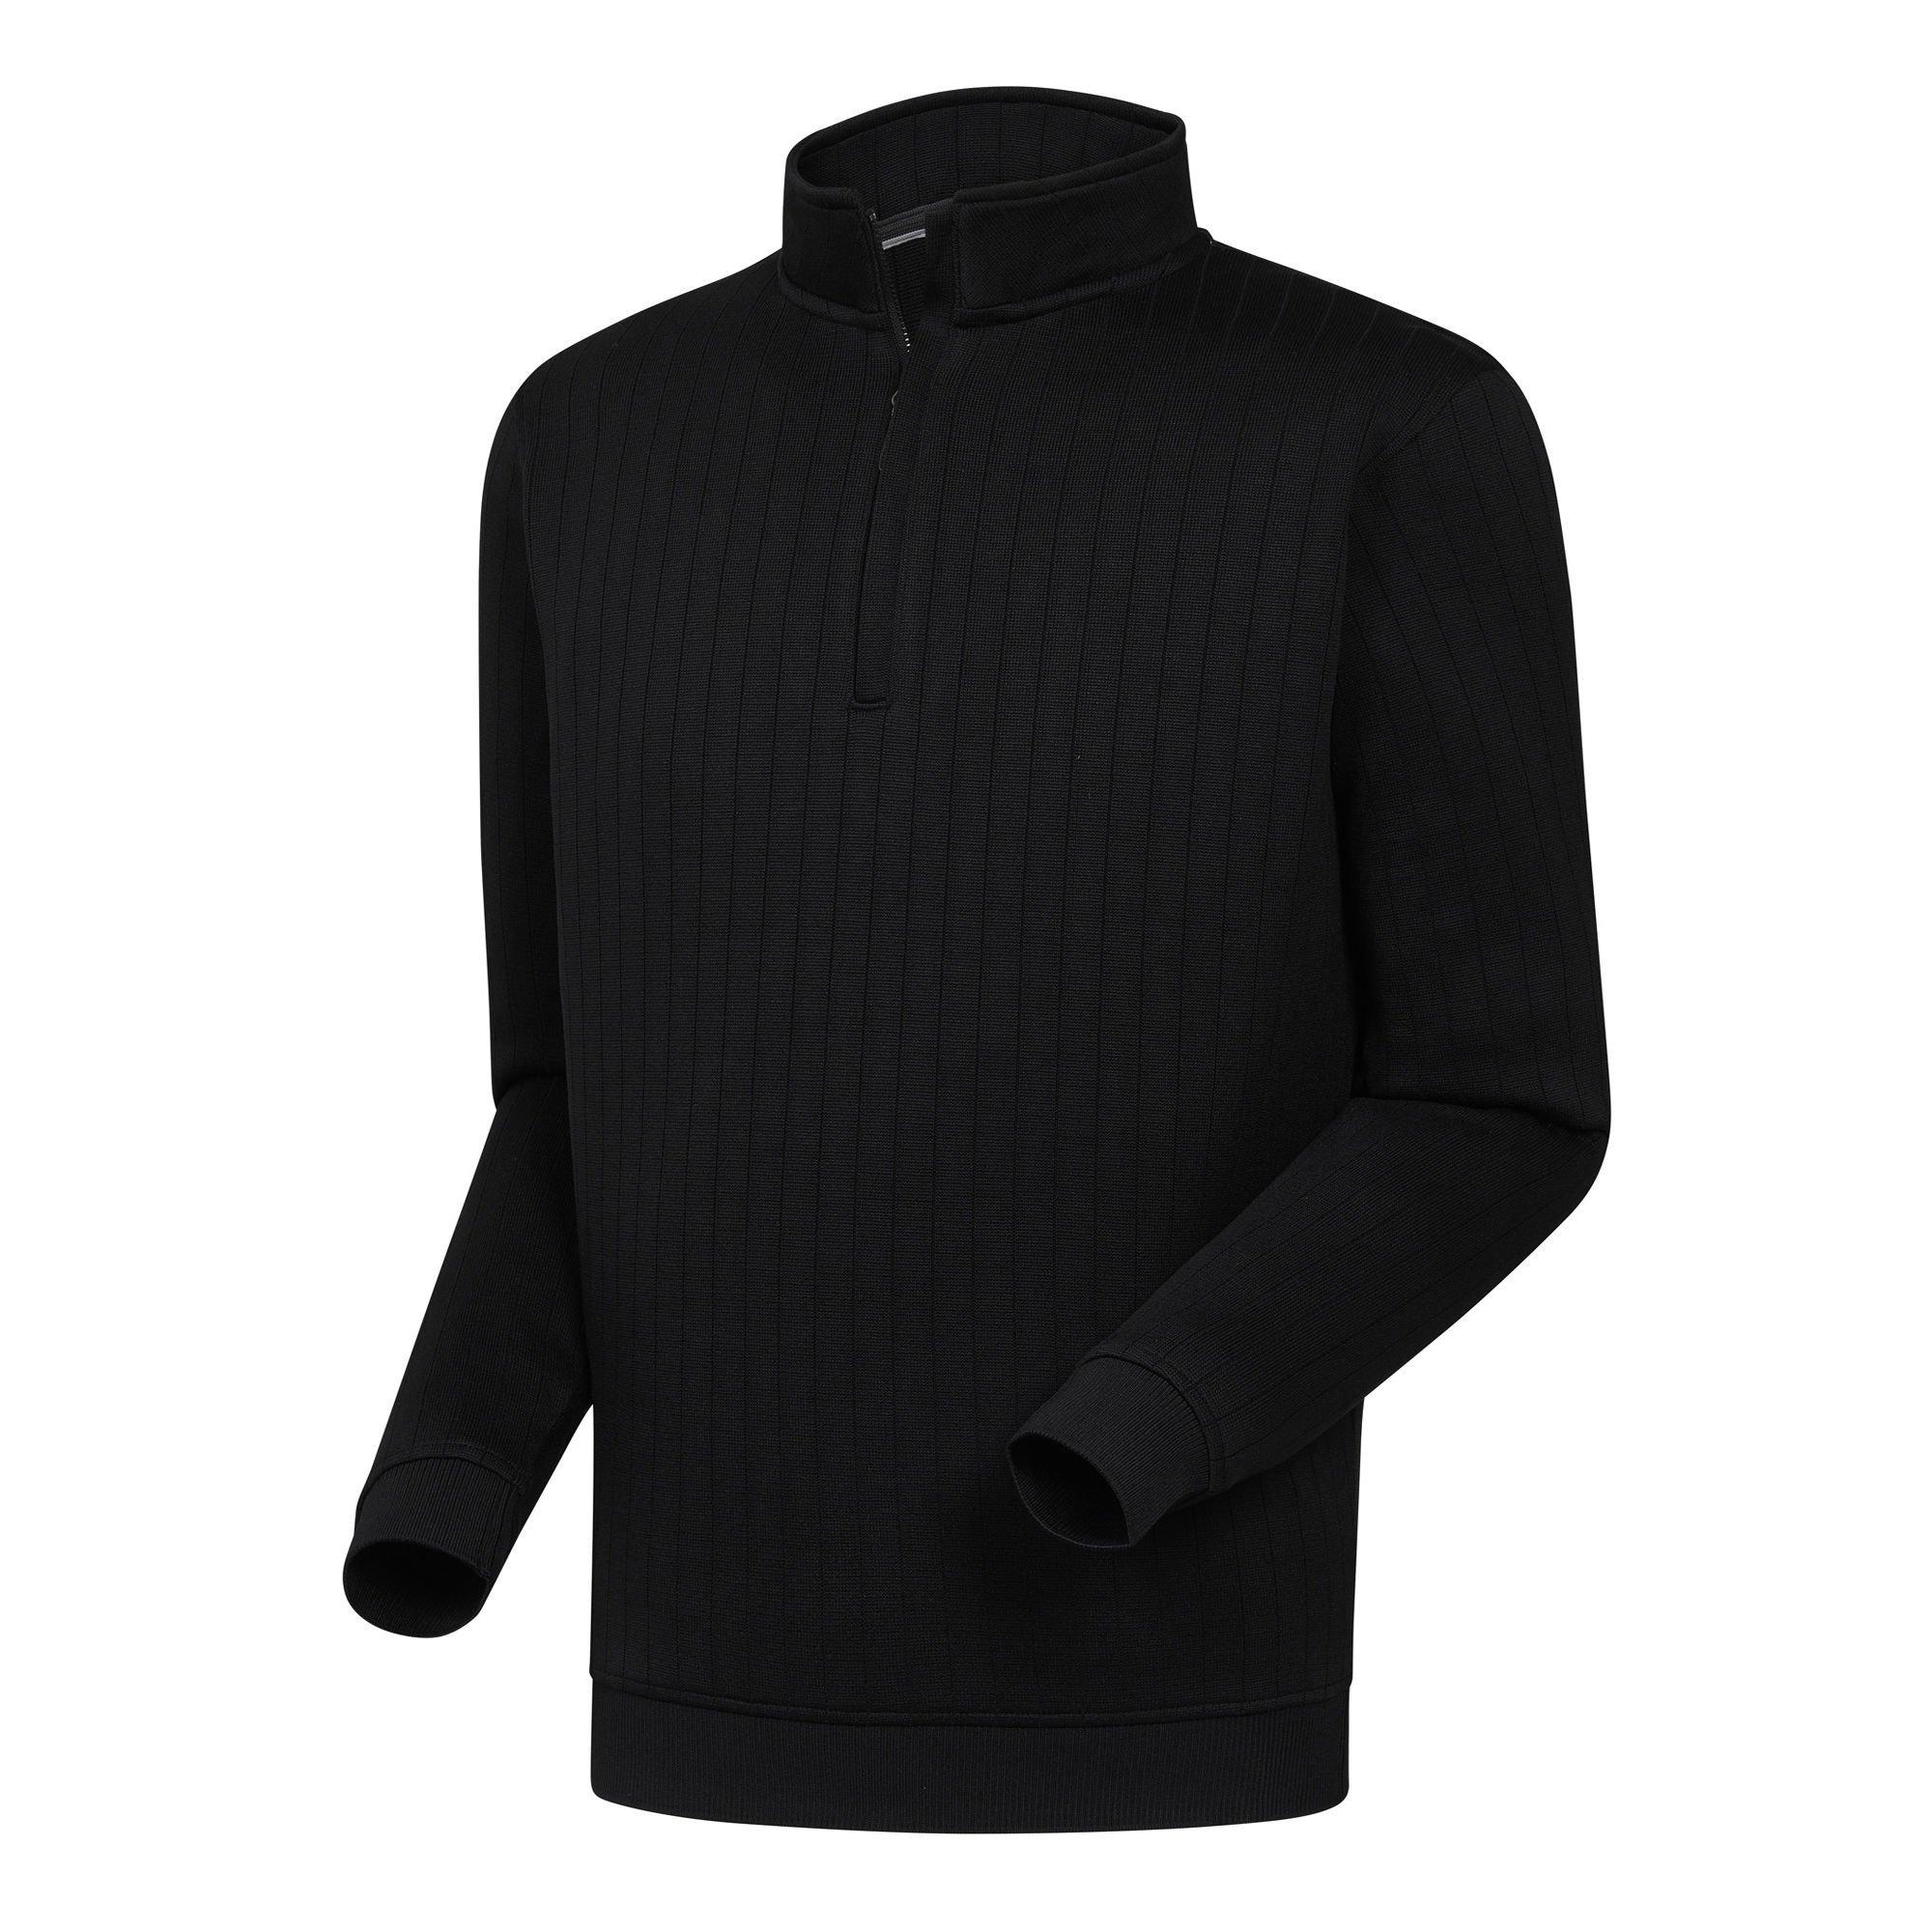 FootJoy Drop Needle Half-Zip Gathered Waist Black, Medium